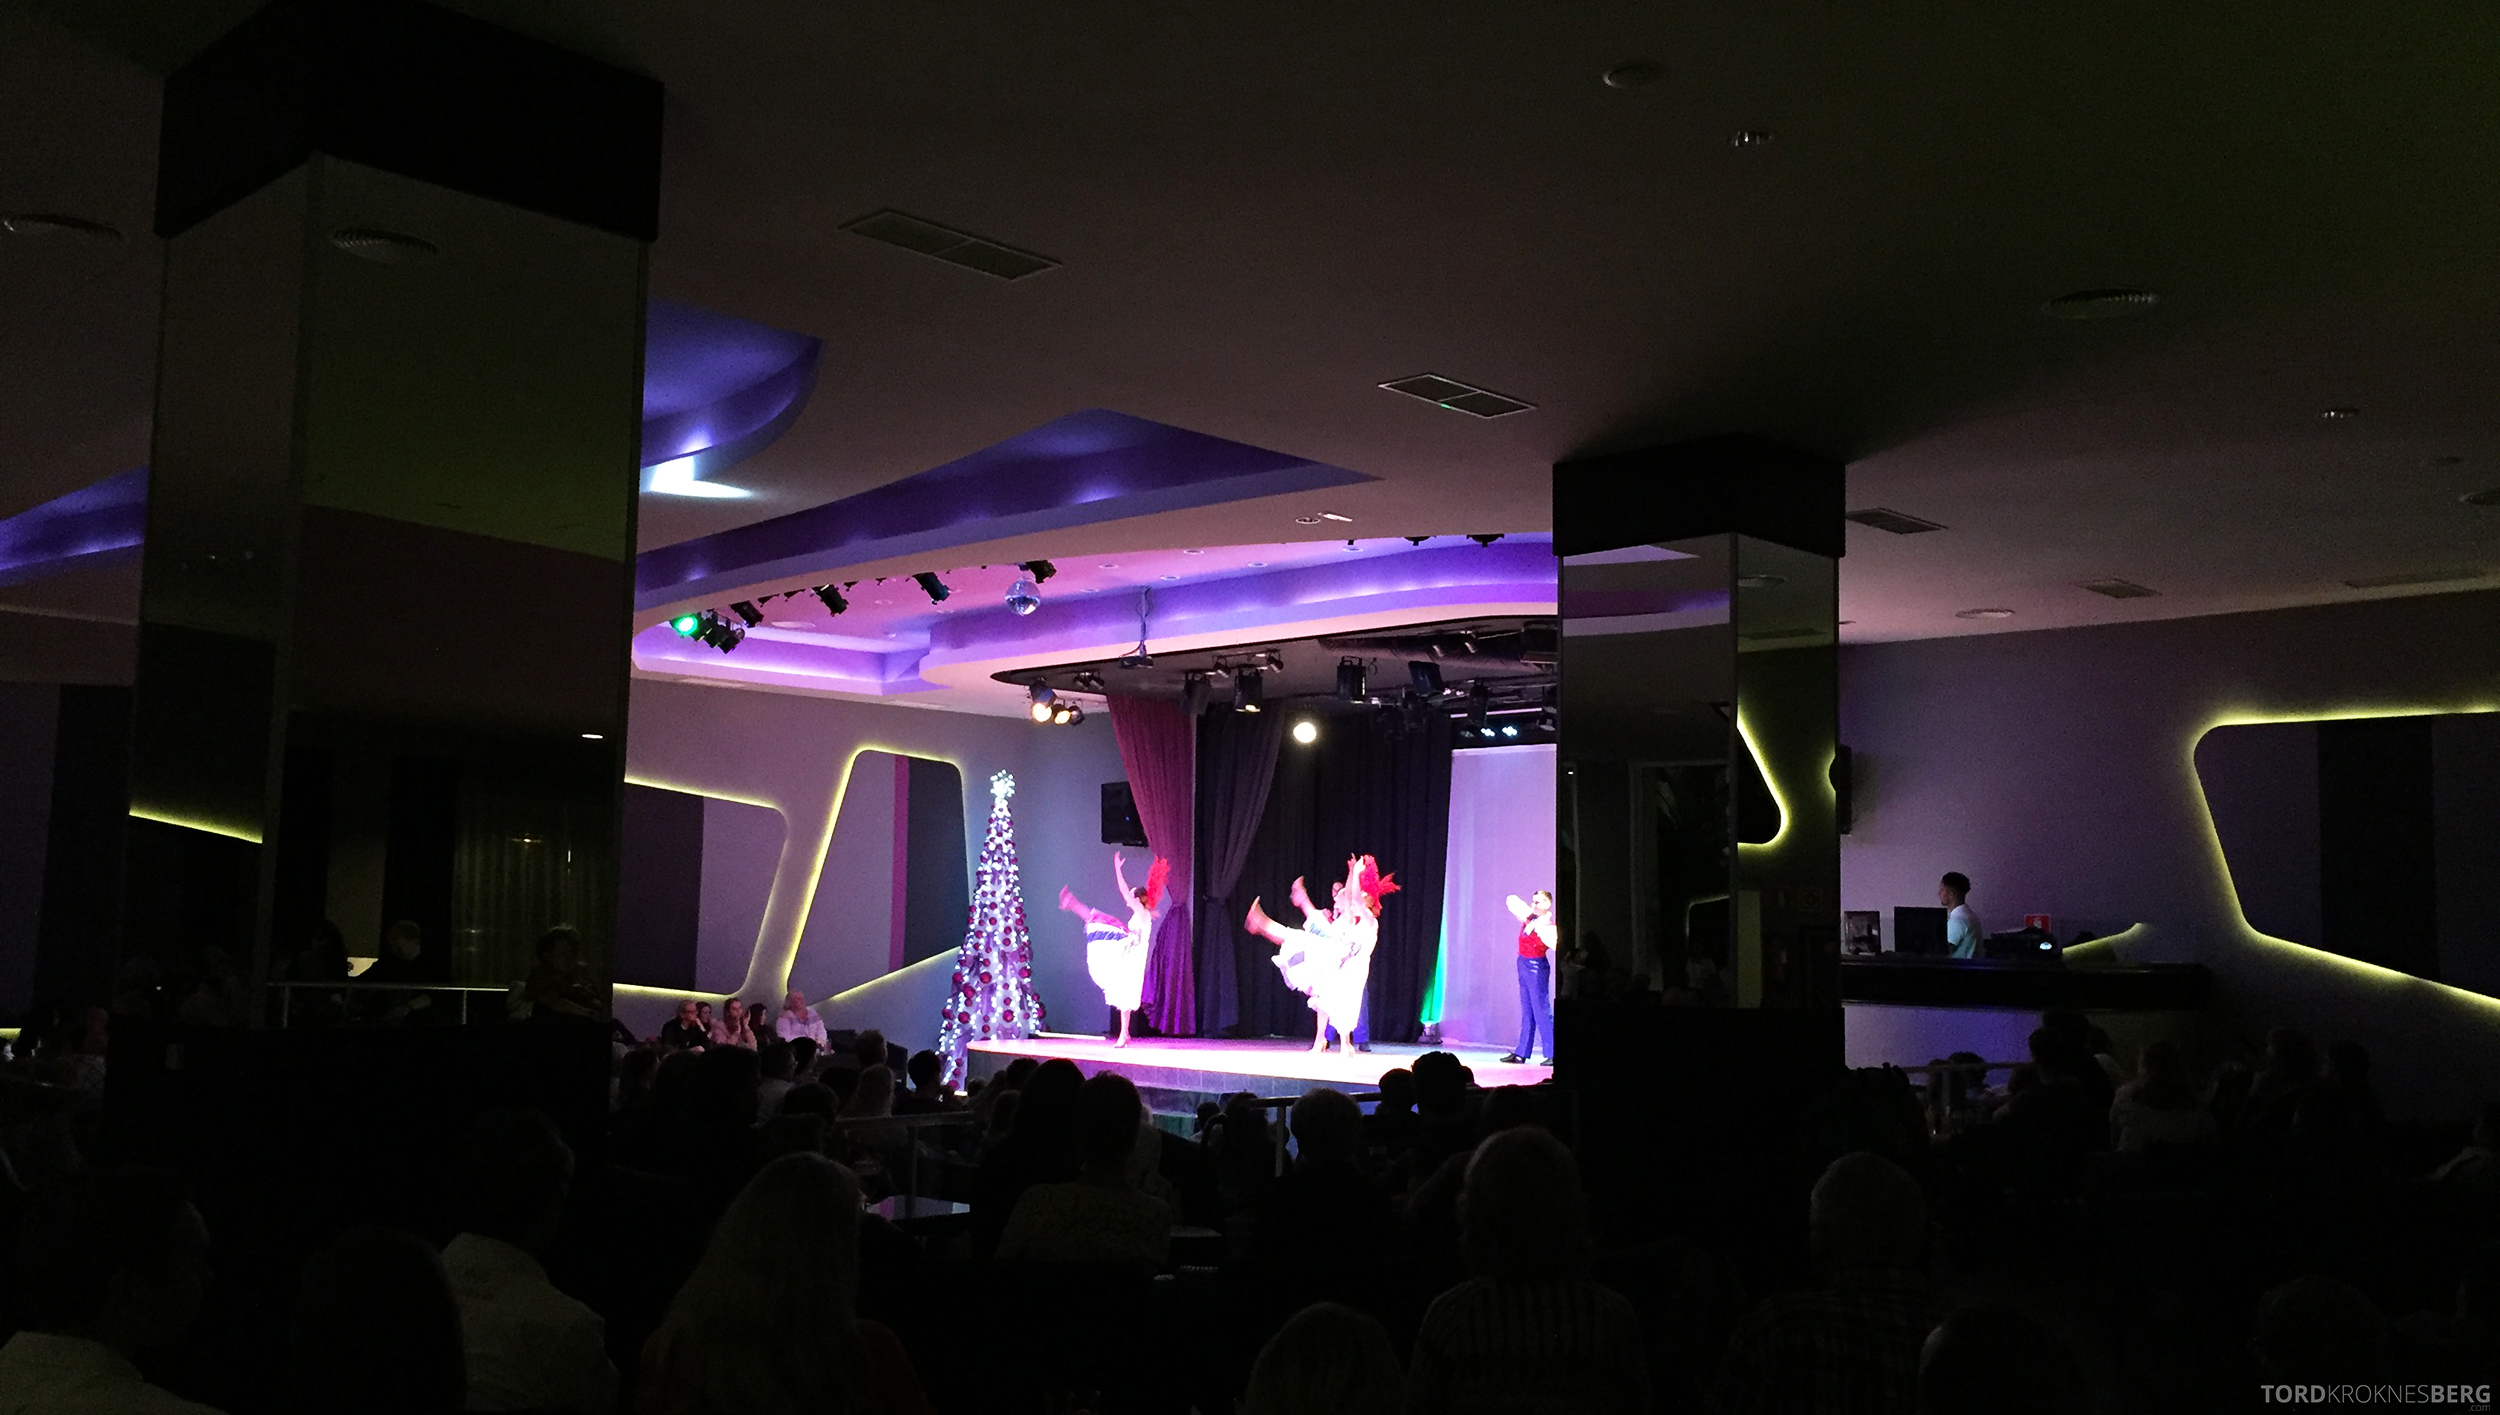 ClubHotel RIU Gran Canaria underholdning